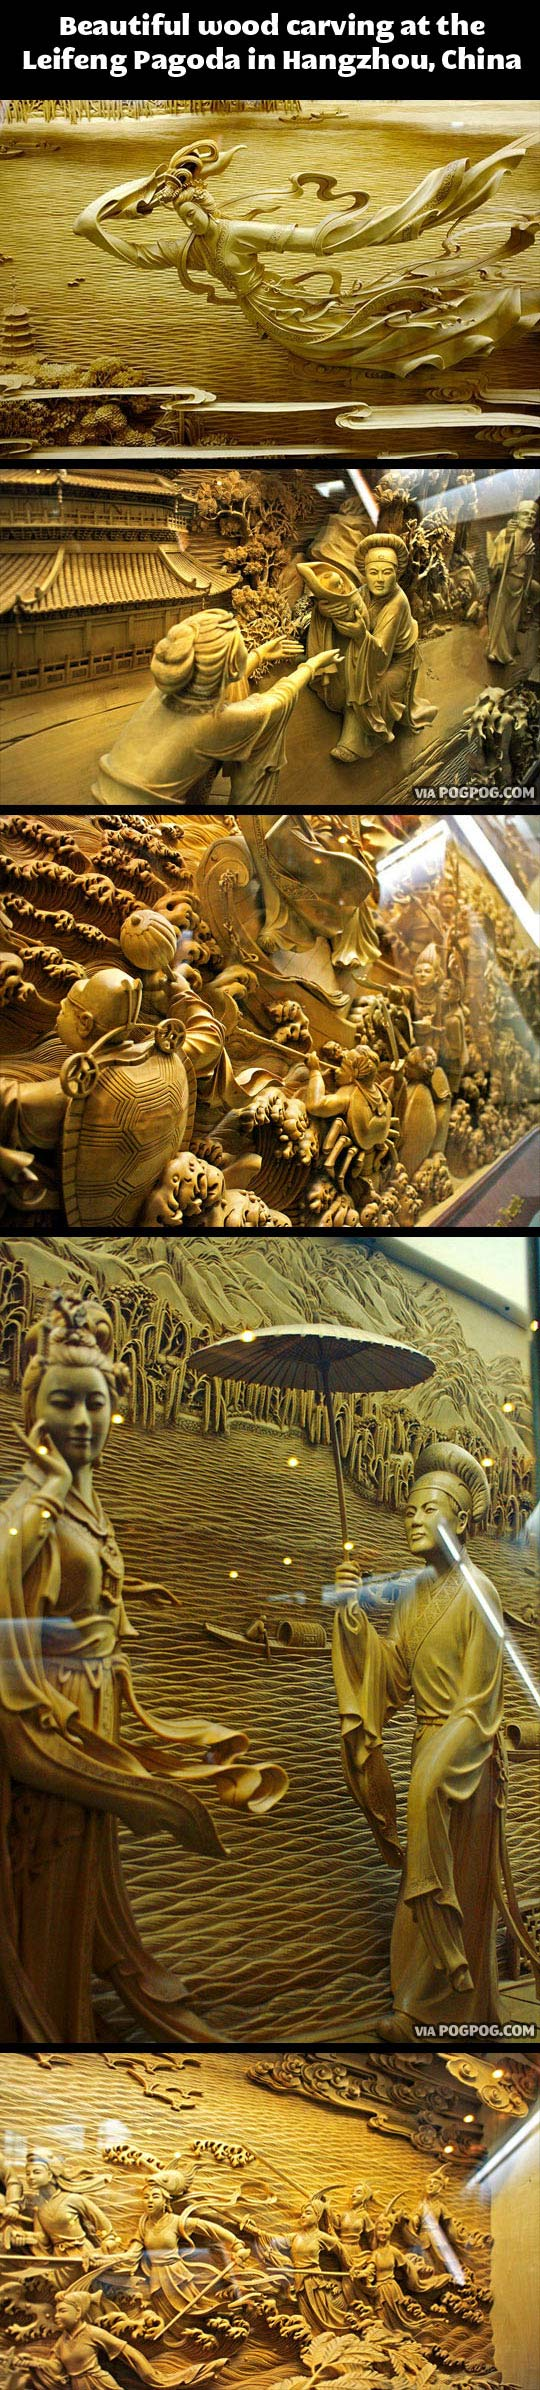 cool-wood-carving-Leifeng-Pagoda-China